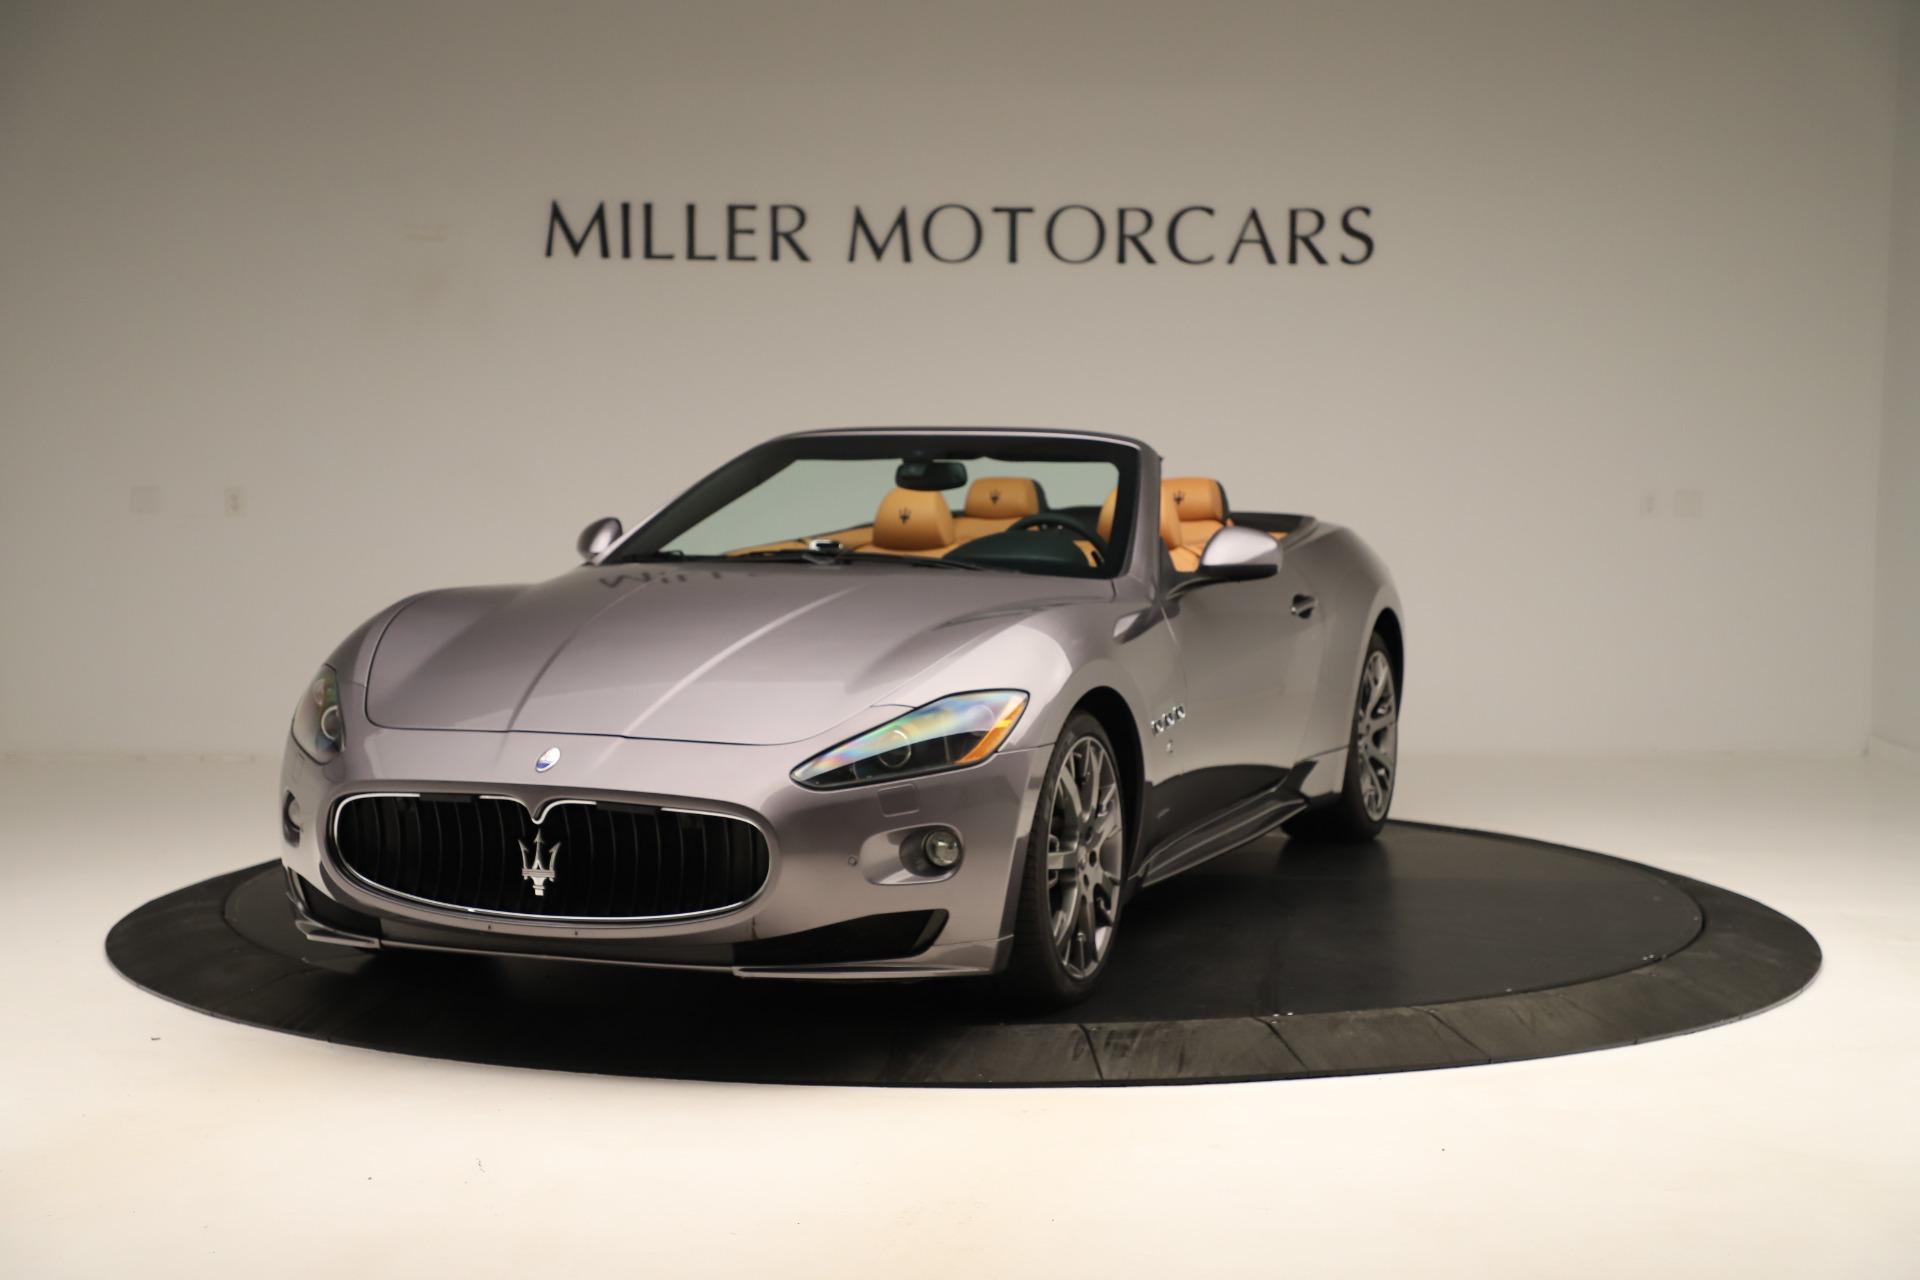 Used 2012 Maserati GranTurismo Sport for sale Sold at Pagani of Greenwich in Greenwich CT 06830 1